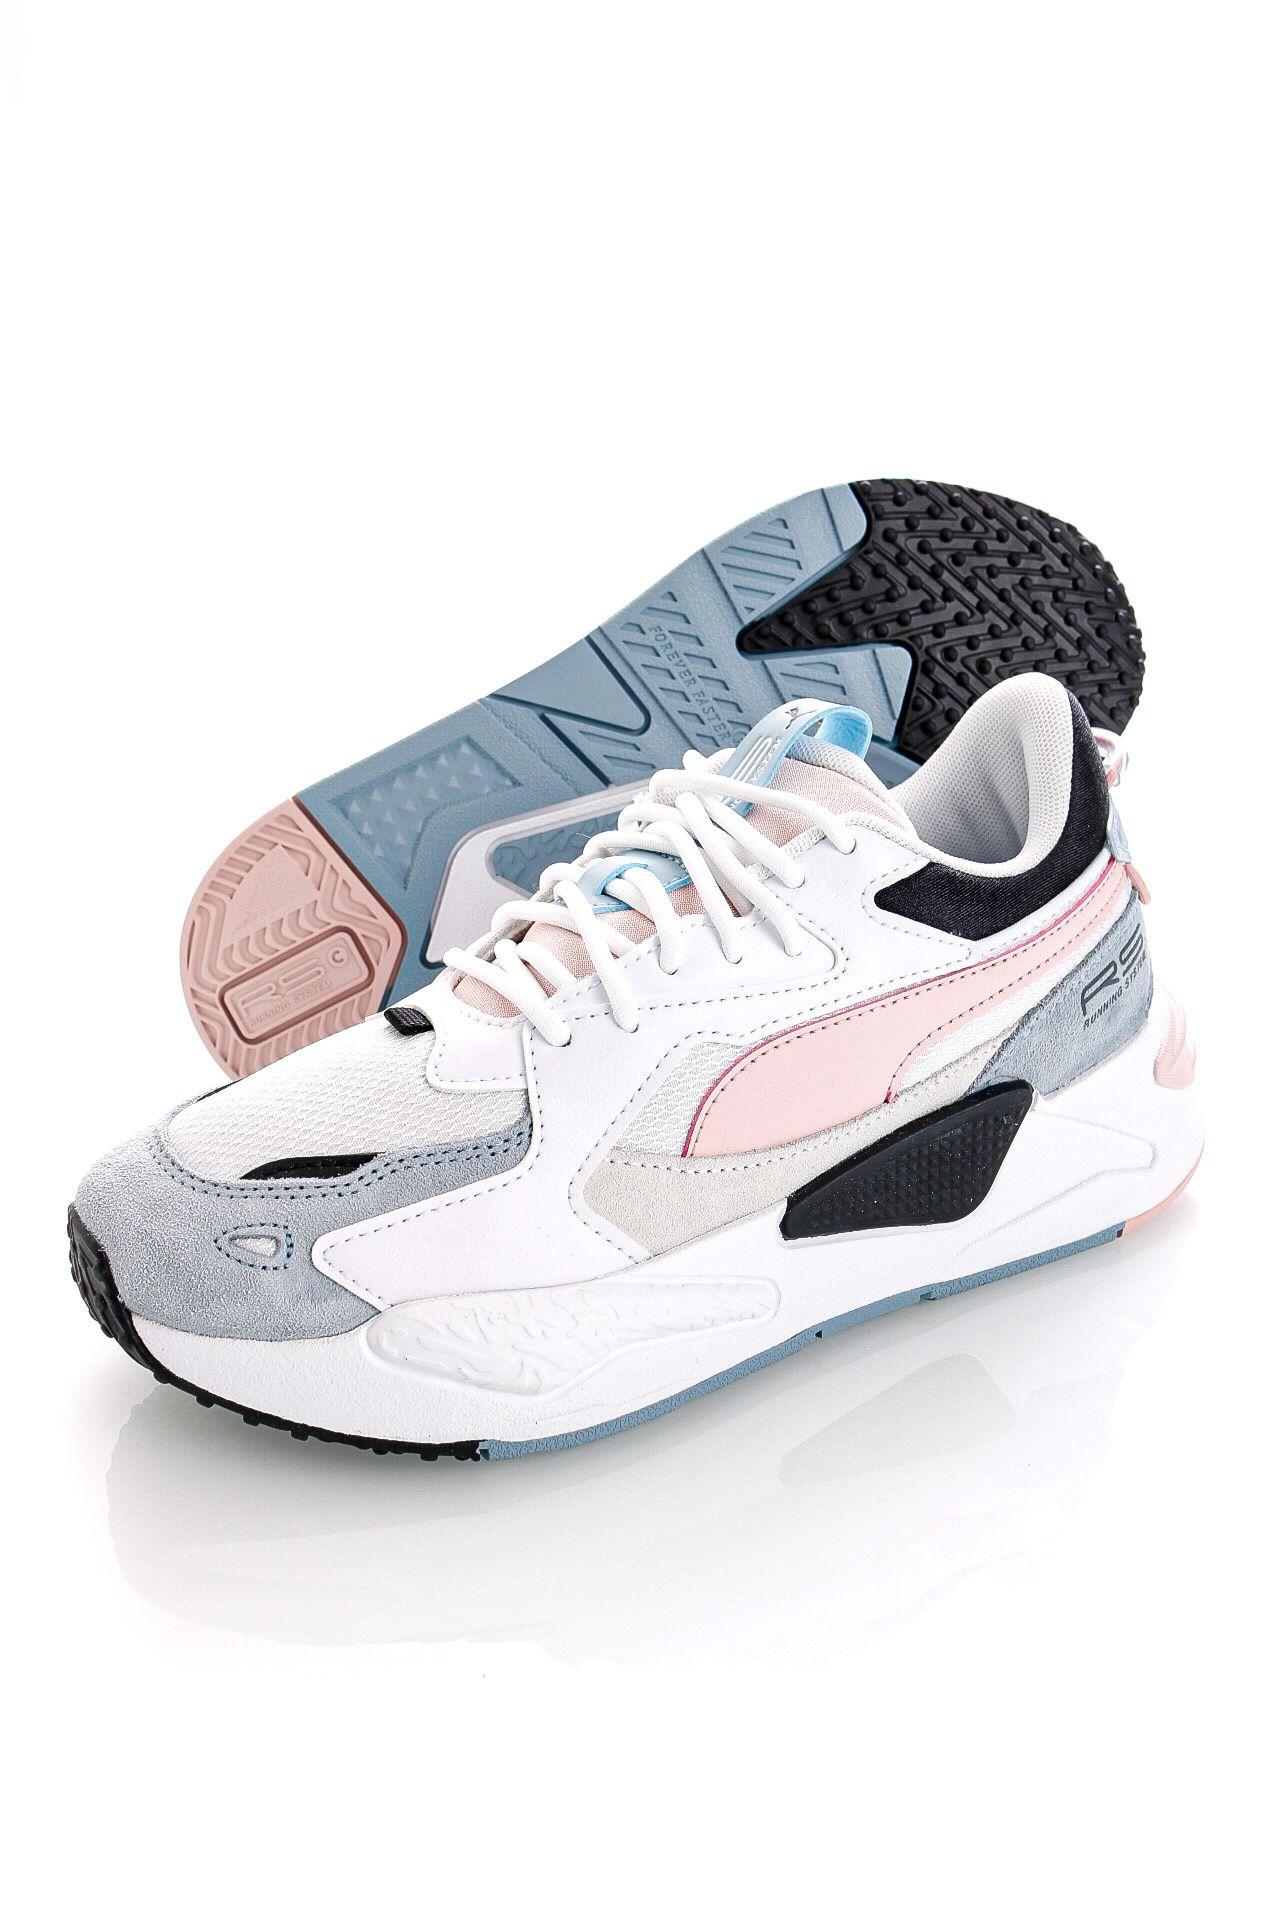 Afbeelding van Puma Sneakers RS-Z Reinvent Wns Puma White-Lotus-Blue Fog 38321902